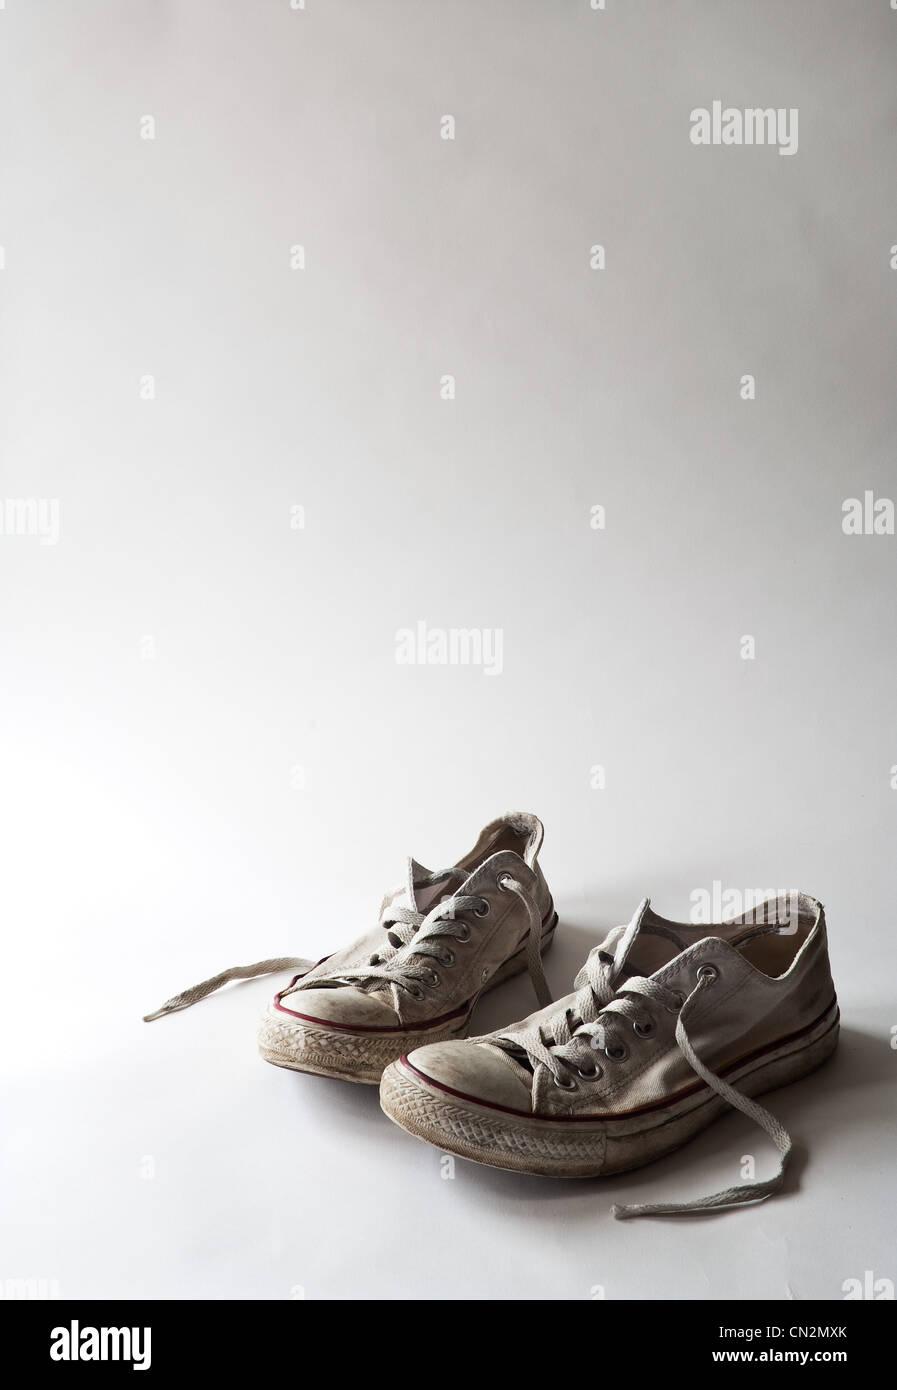 Pair of training shoes, studio shot - Stock Image